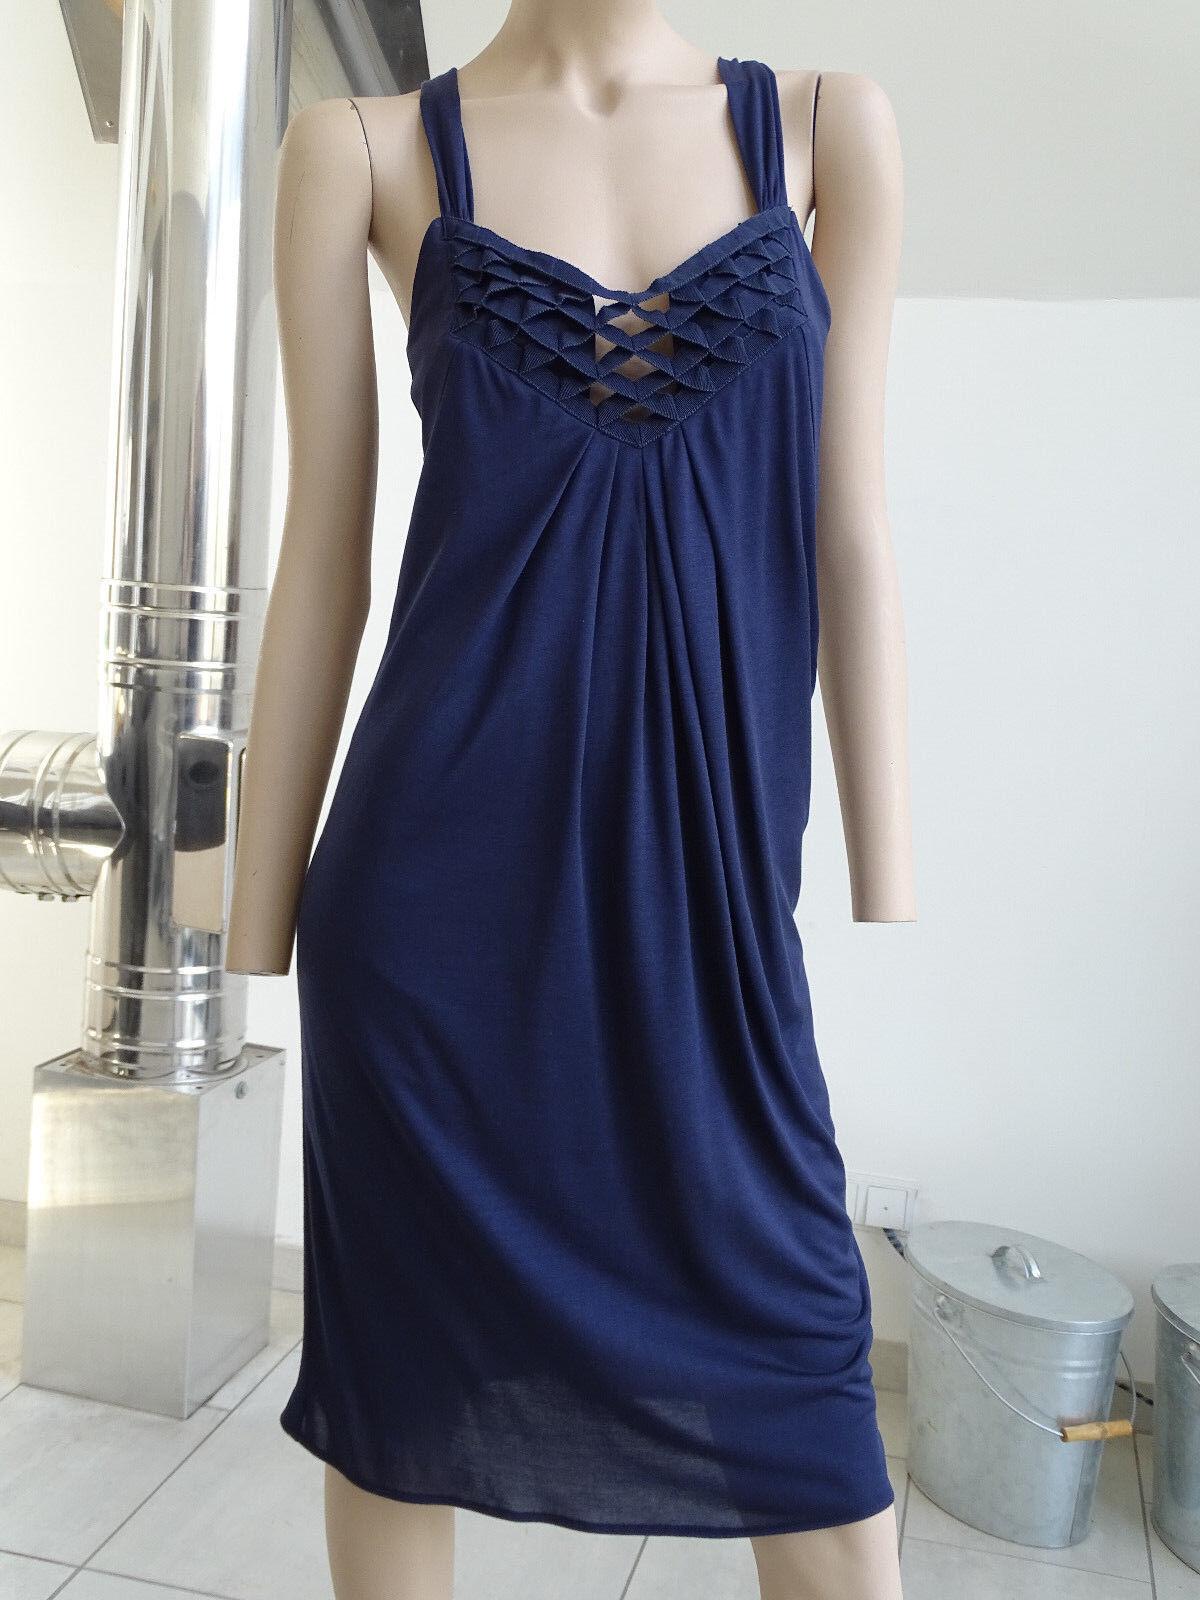 af2274fdadaadb Hondrocream ist die Schnellste Strenesse Kleid Gr. 34 blau blau blau wie  neu 85e426